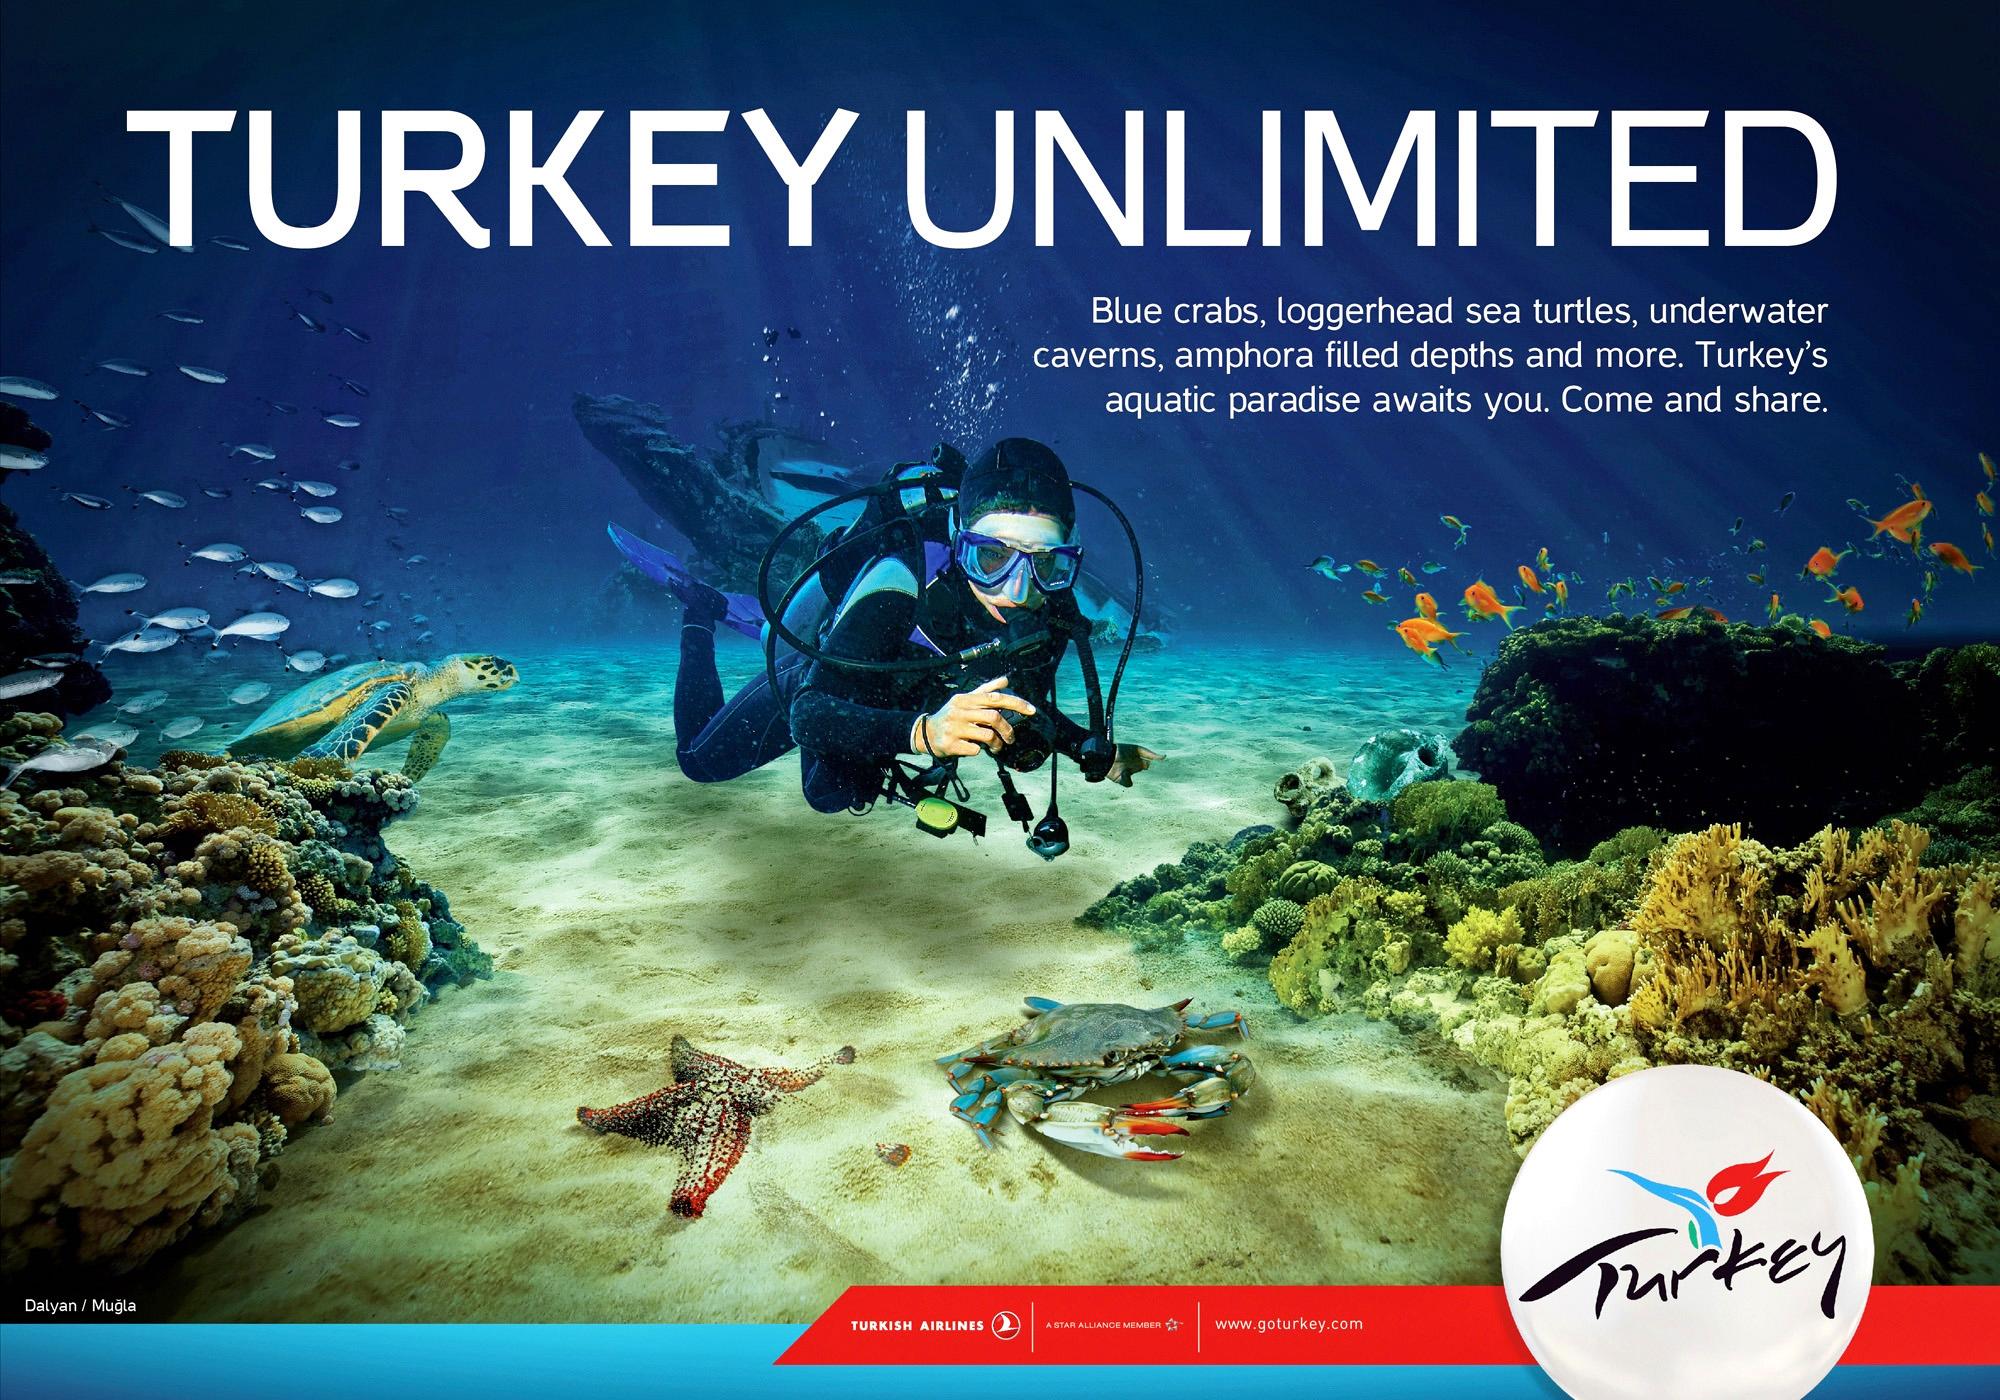 Turkey_2013_7